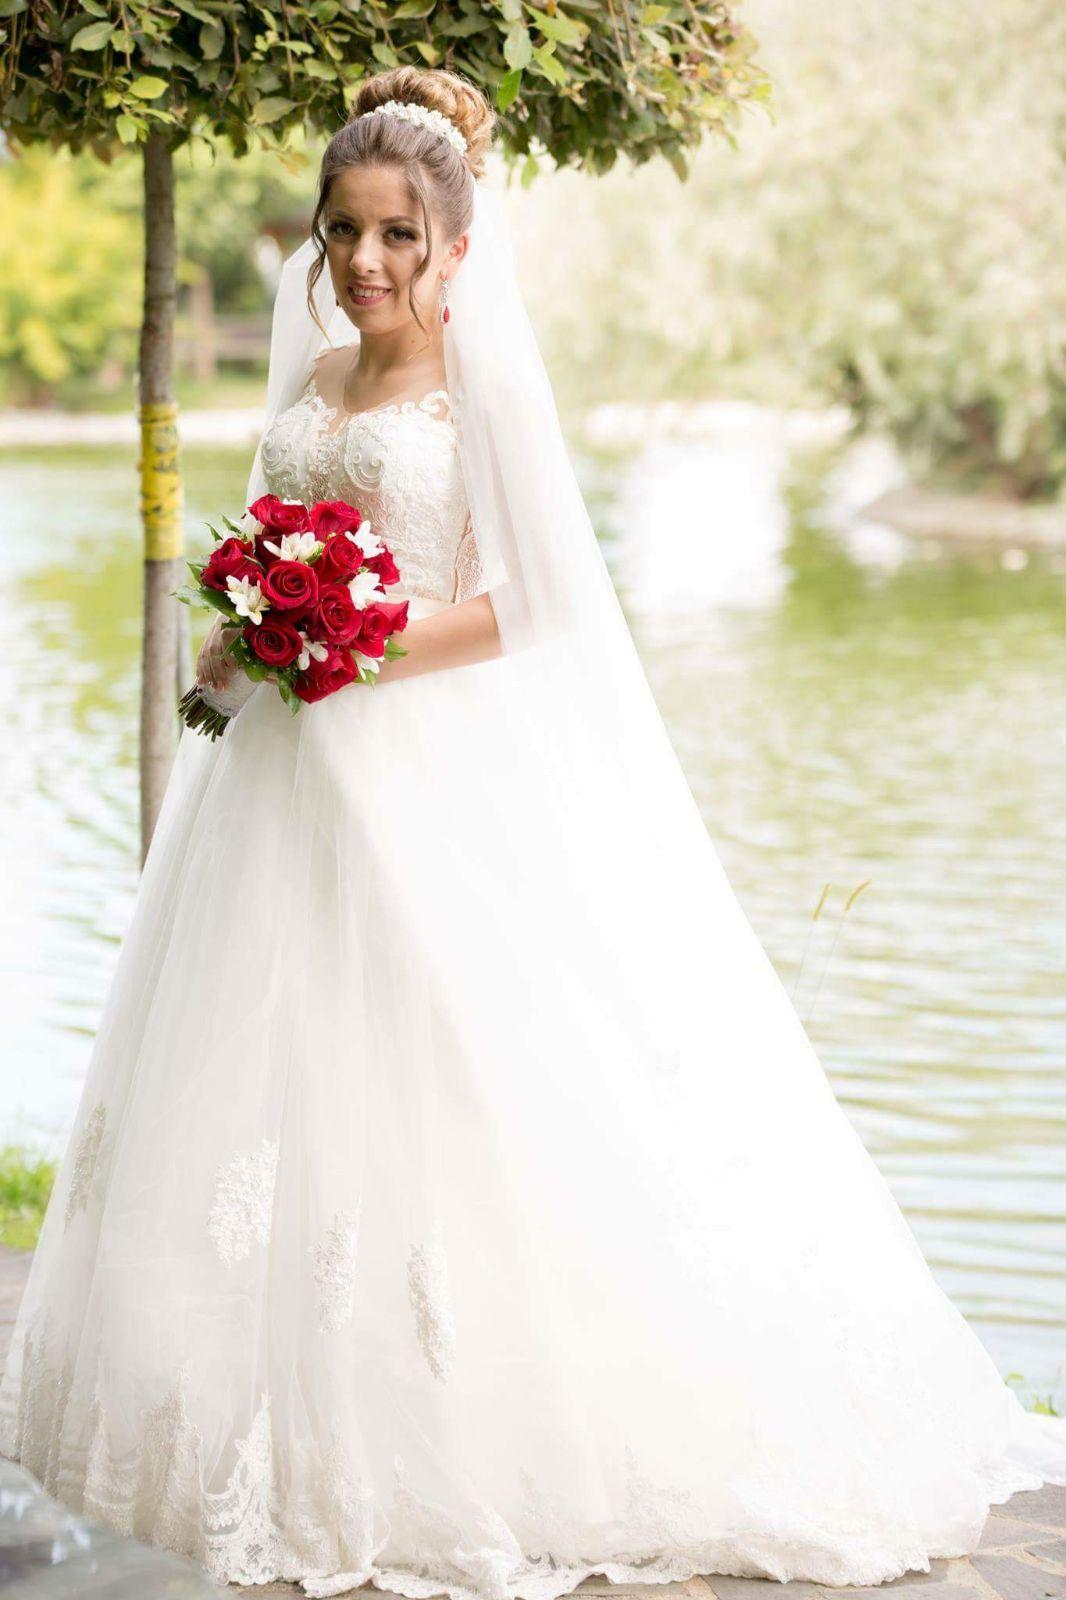 ancuta adora rochia de mireasa 5 in 1 (21)